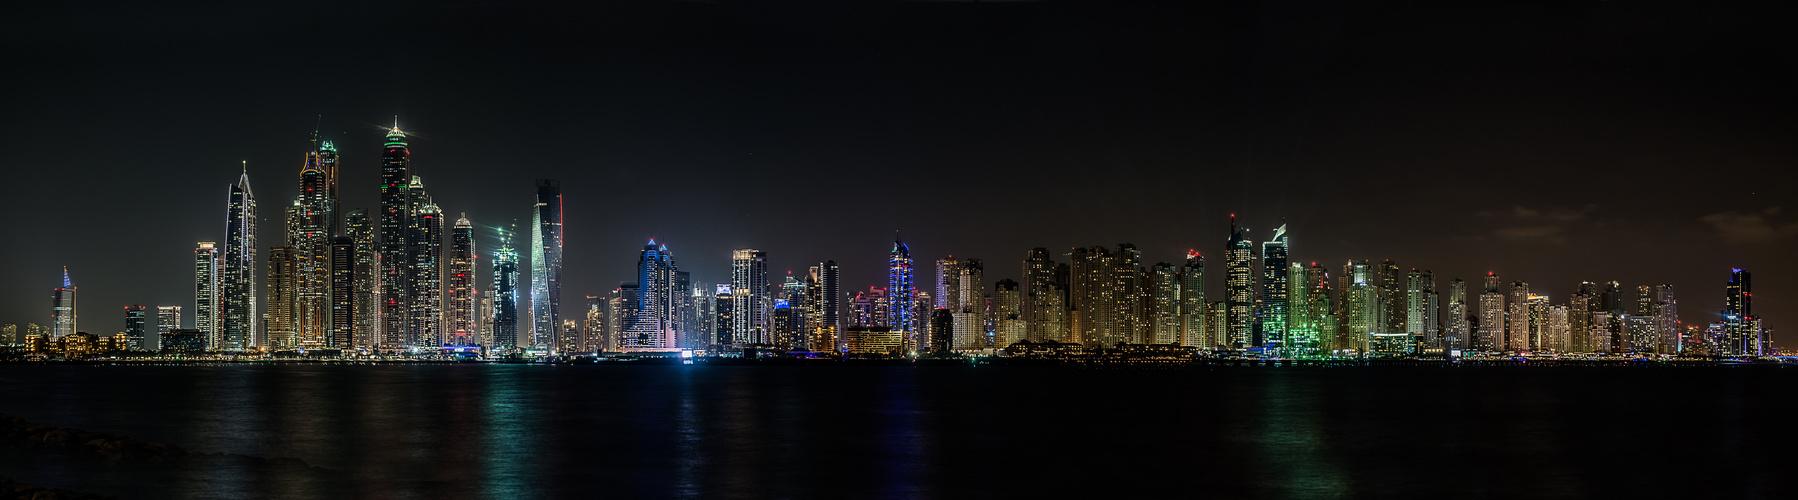 Dubai - Marina Beach